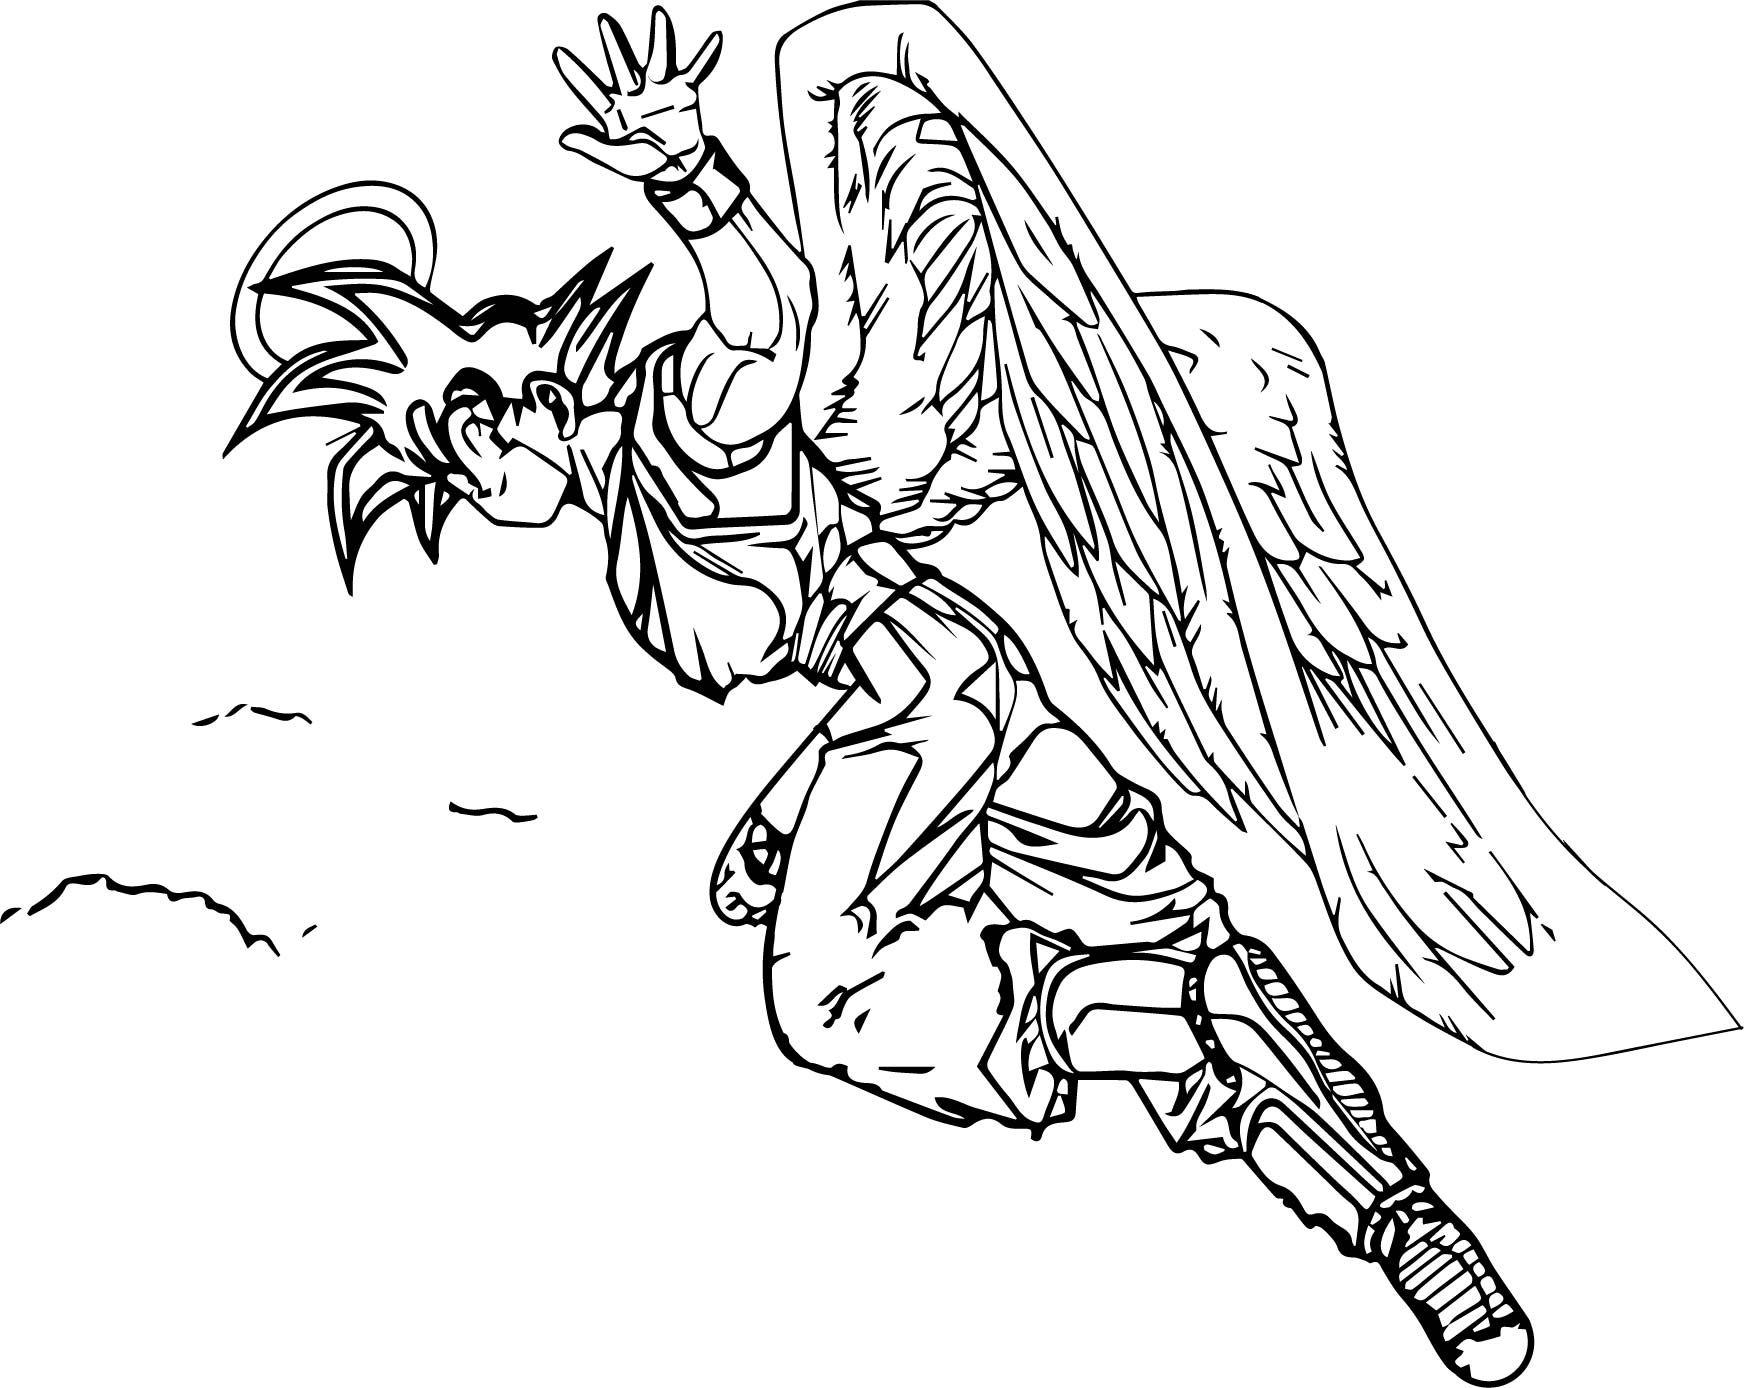 Awesome Goku Angel Coloring Page